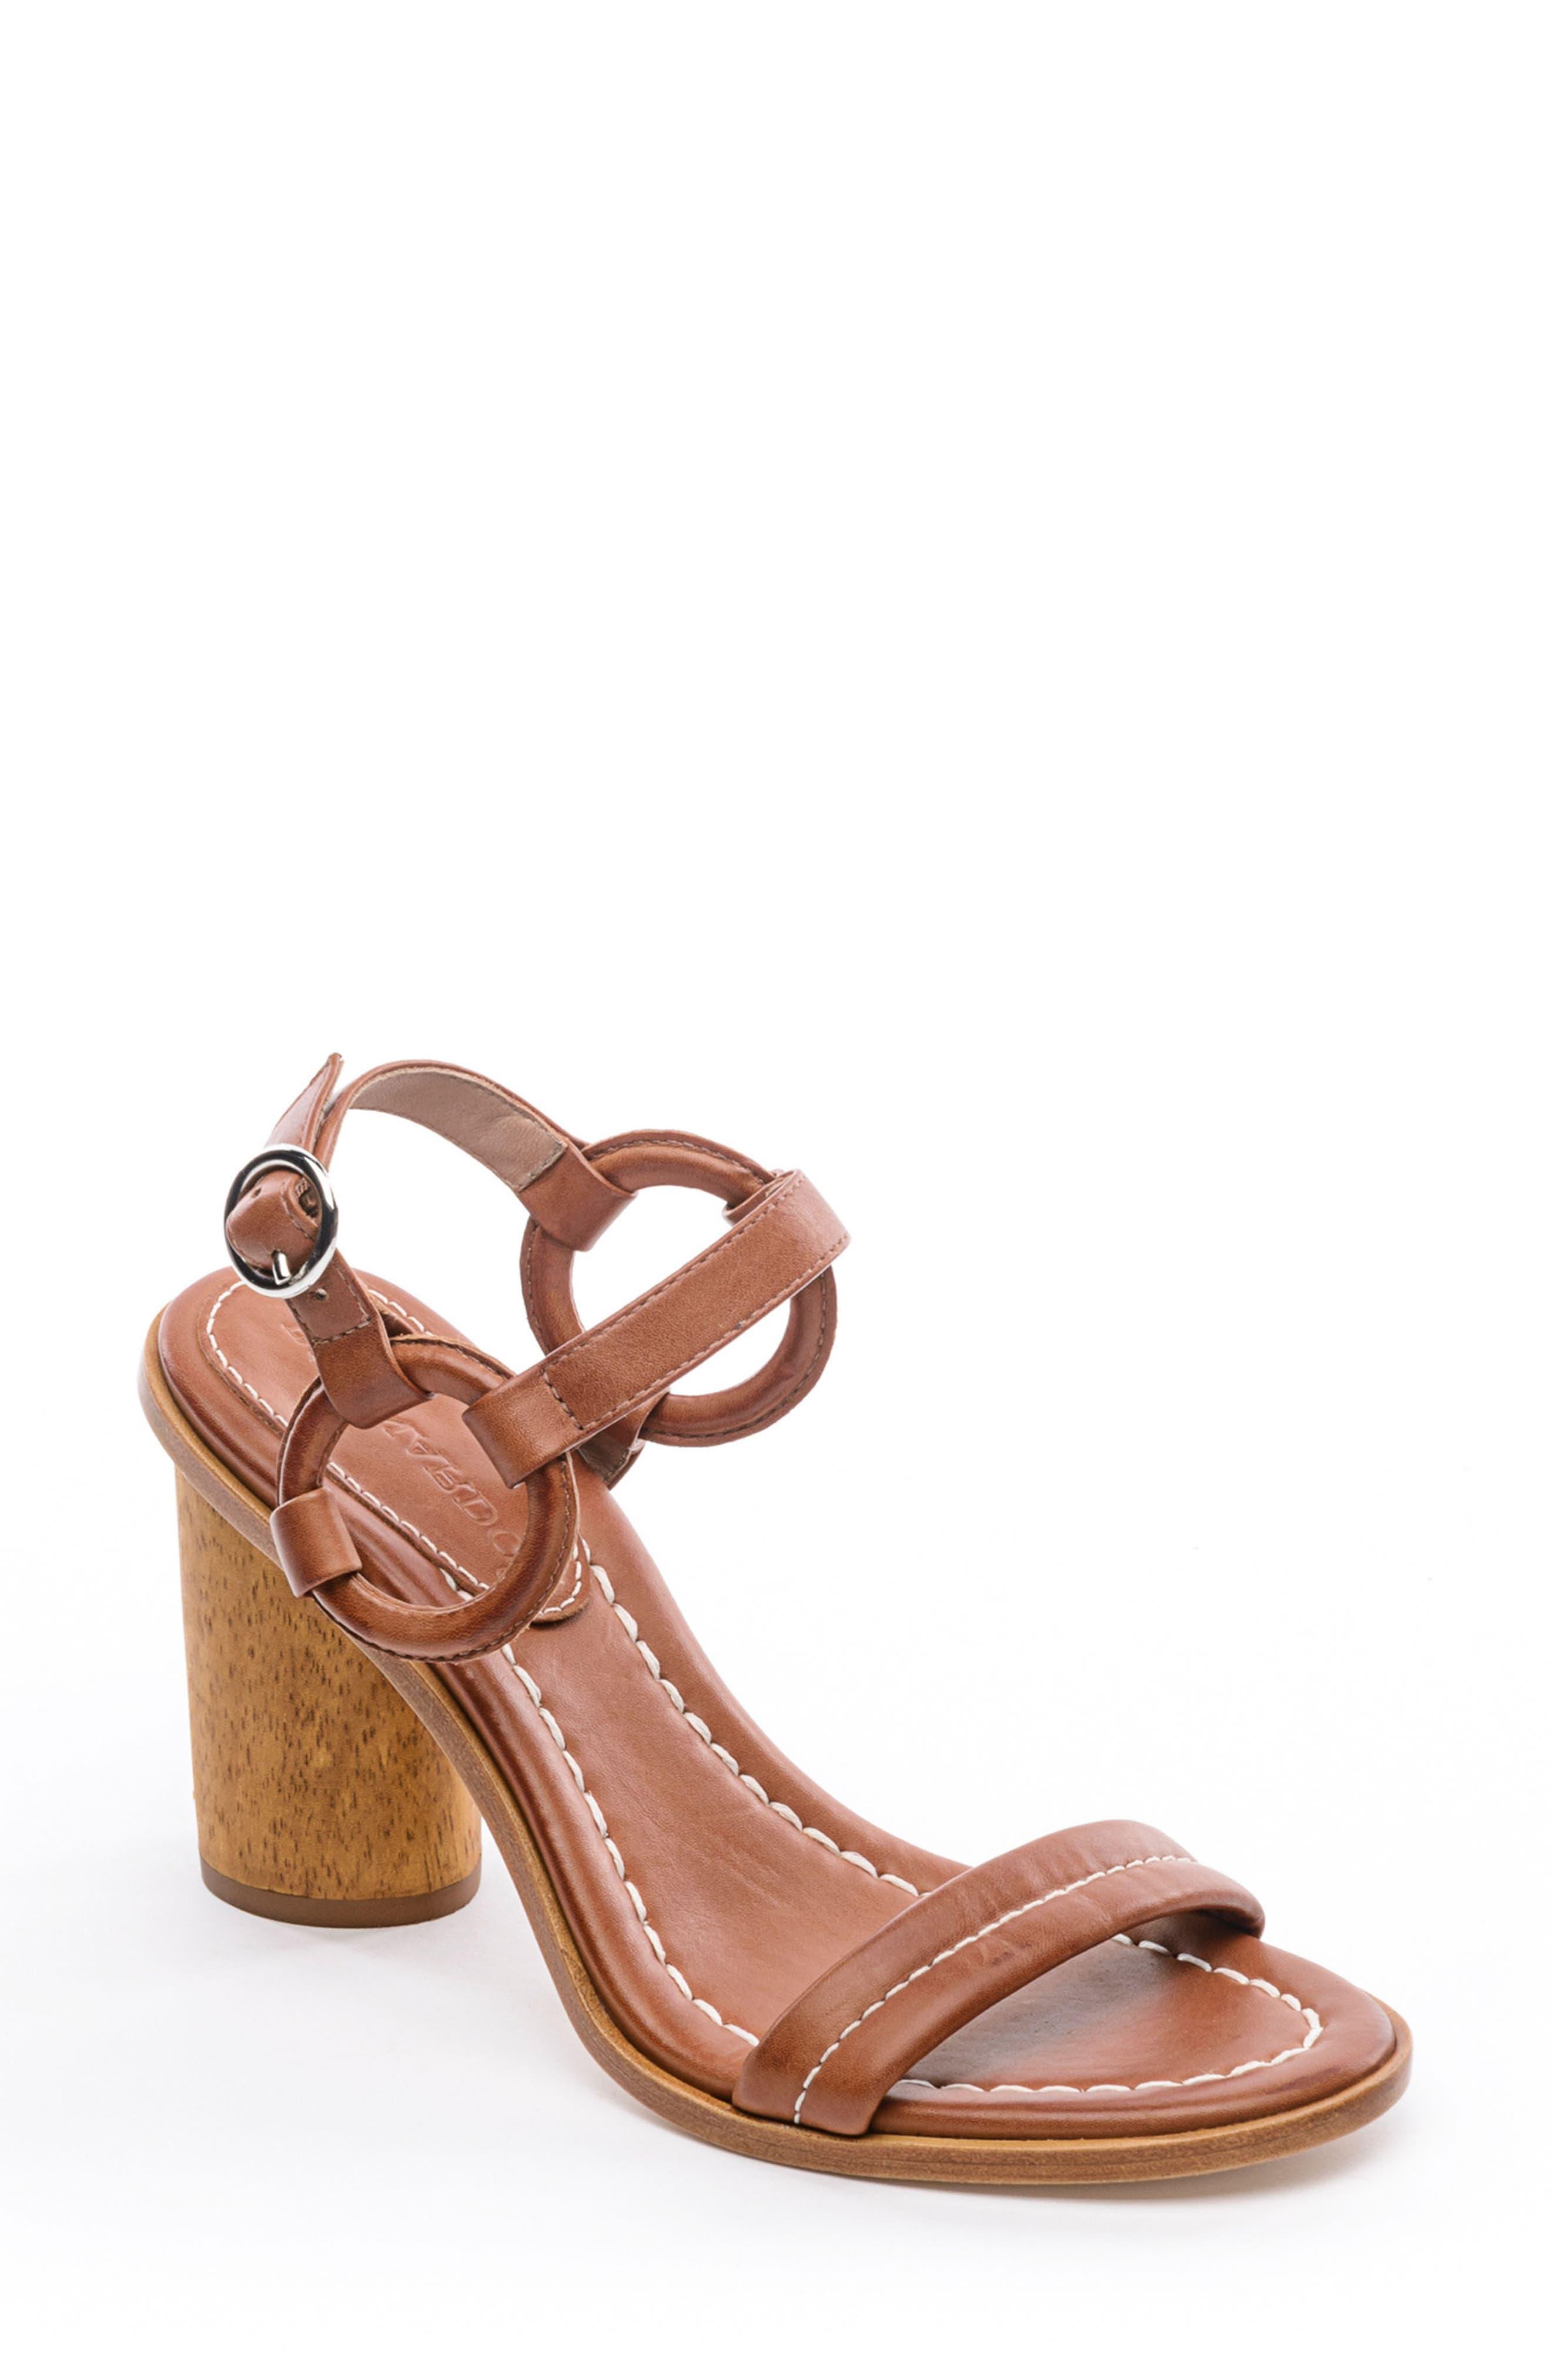 BERNARDO, Harlow Ankle Strap Sandal, Main thumbnail 1, color, LUGGAGE LEATHER